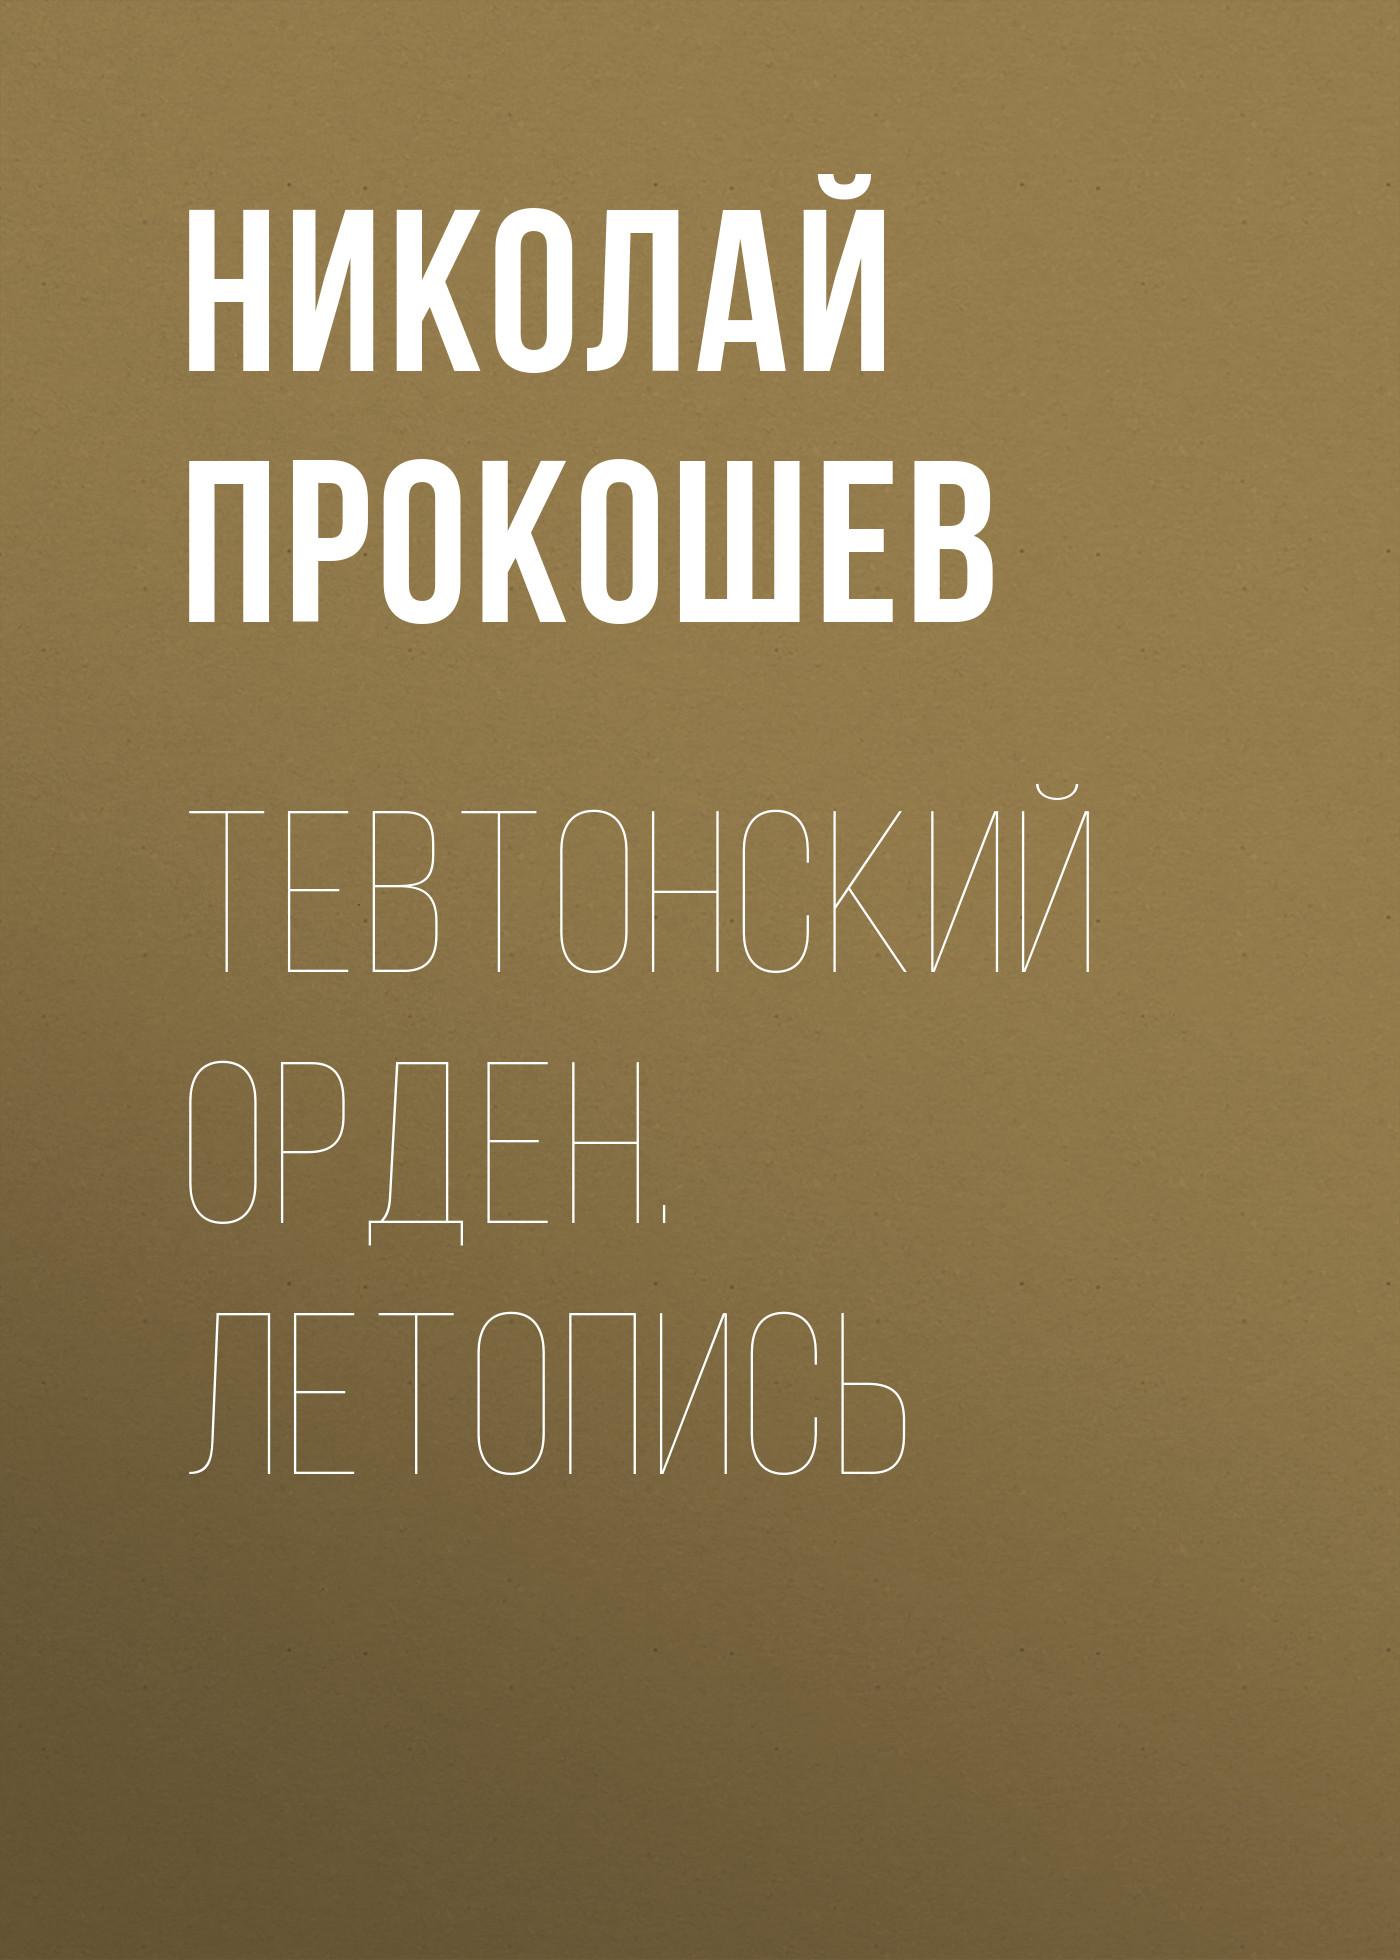 все цены на Николай Прокошев Тевтонский орден. Летопись онлайн